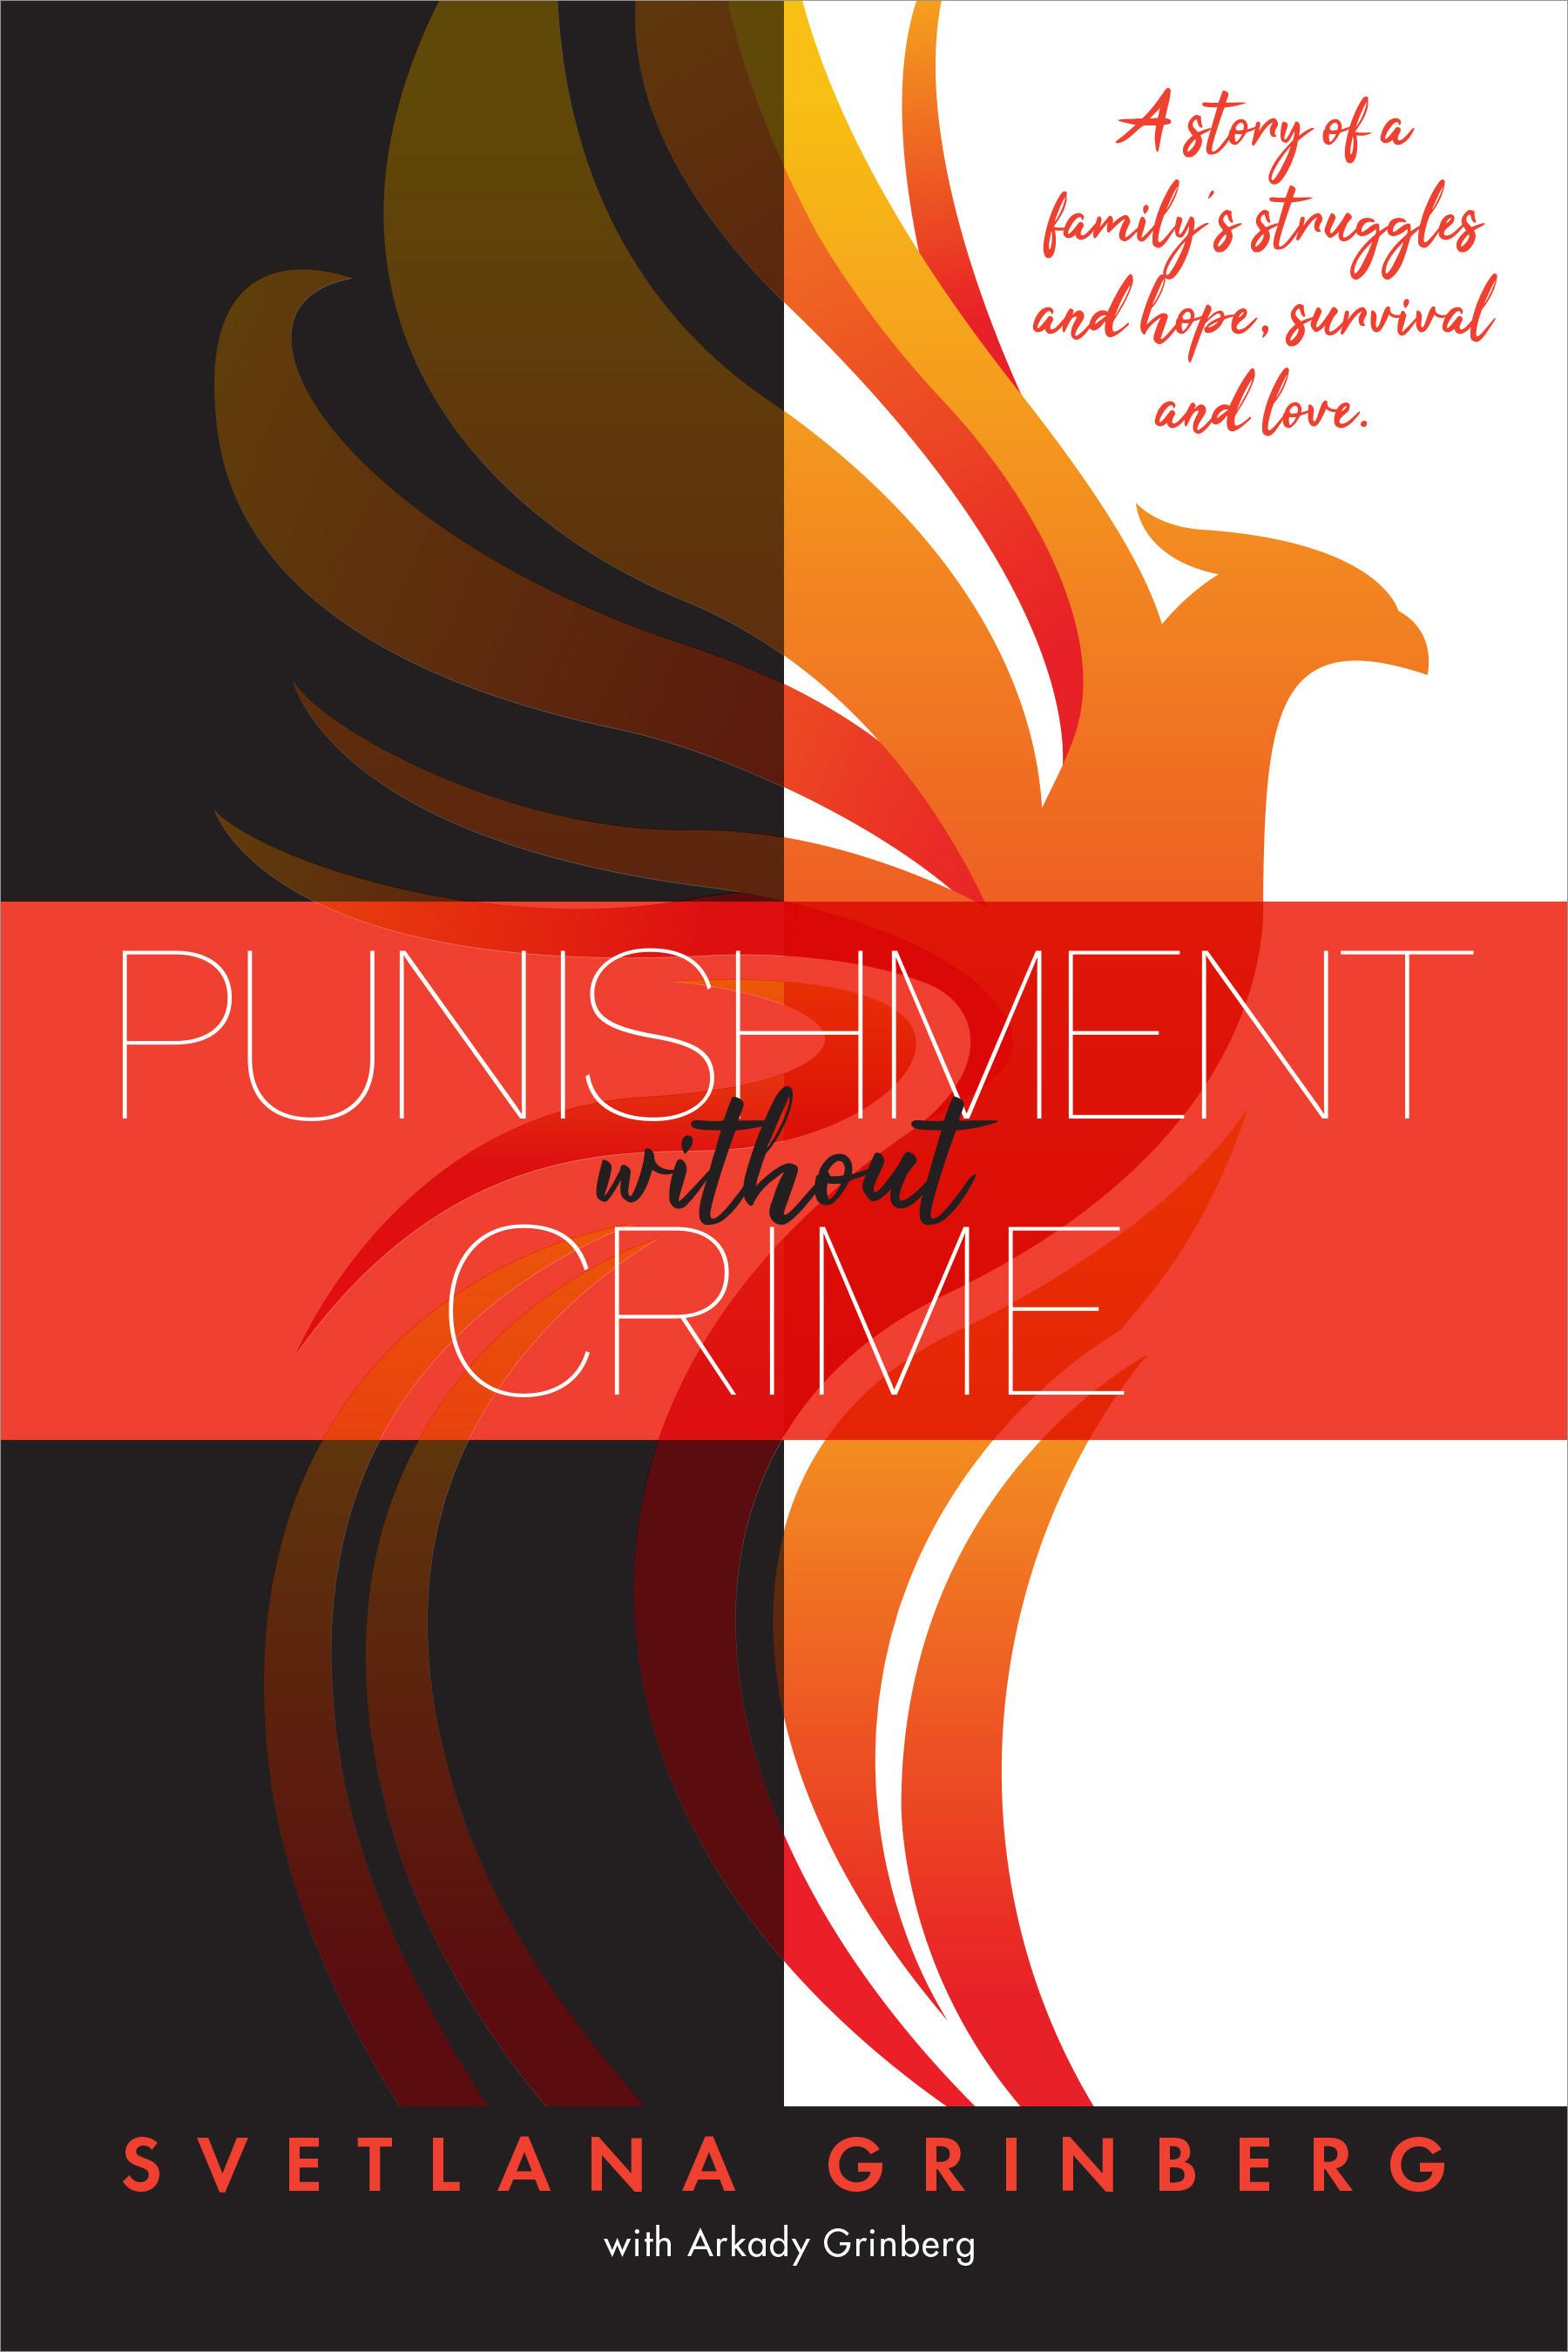 PunishmentWithoutCrime_FrontCover.jpg